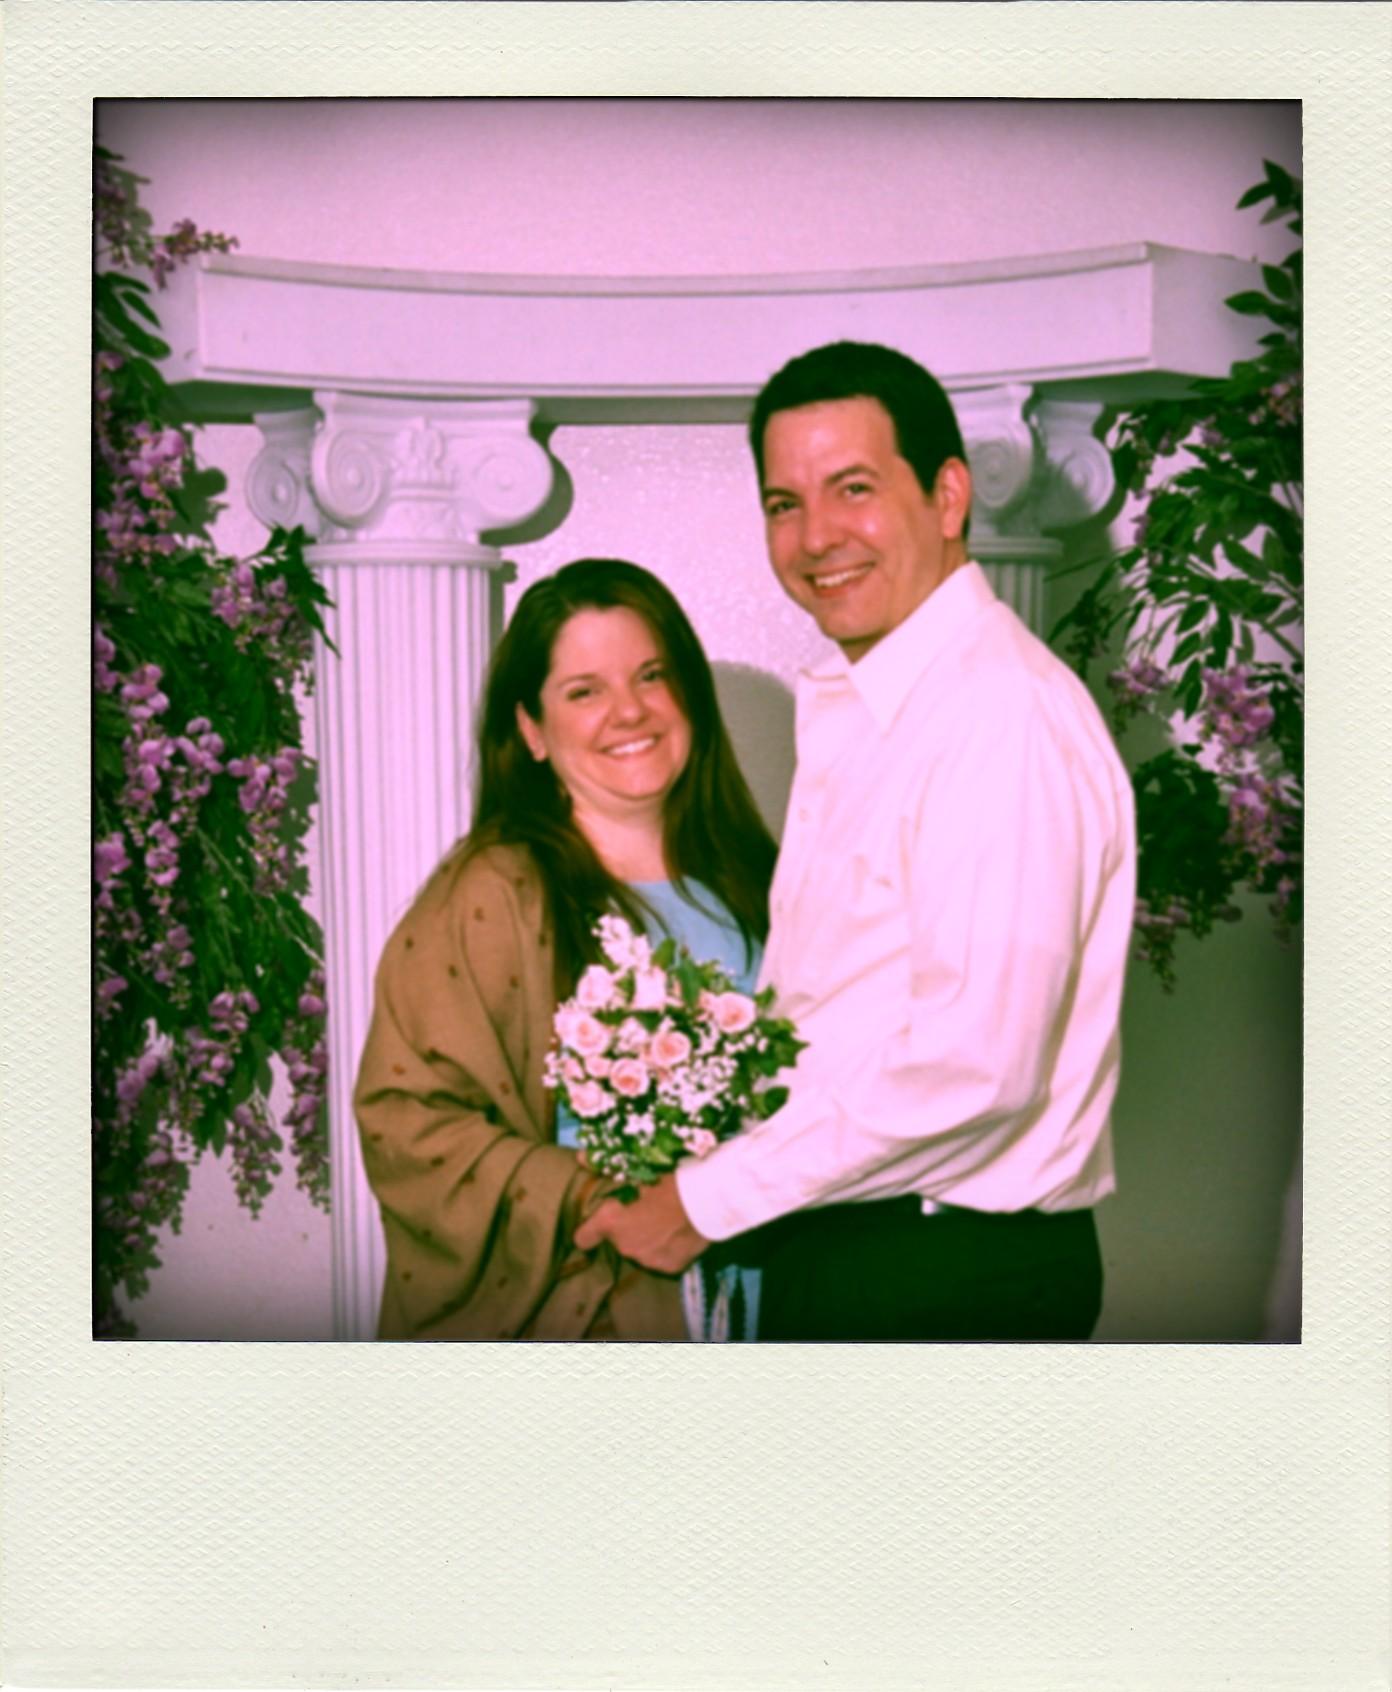 Cheesy Las Vegas Wedding Photo